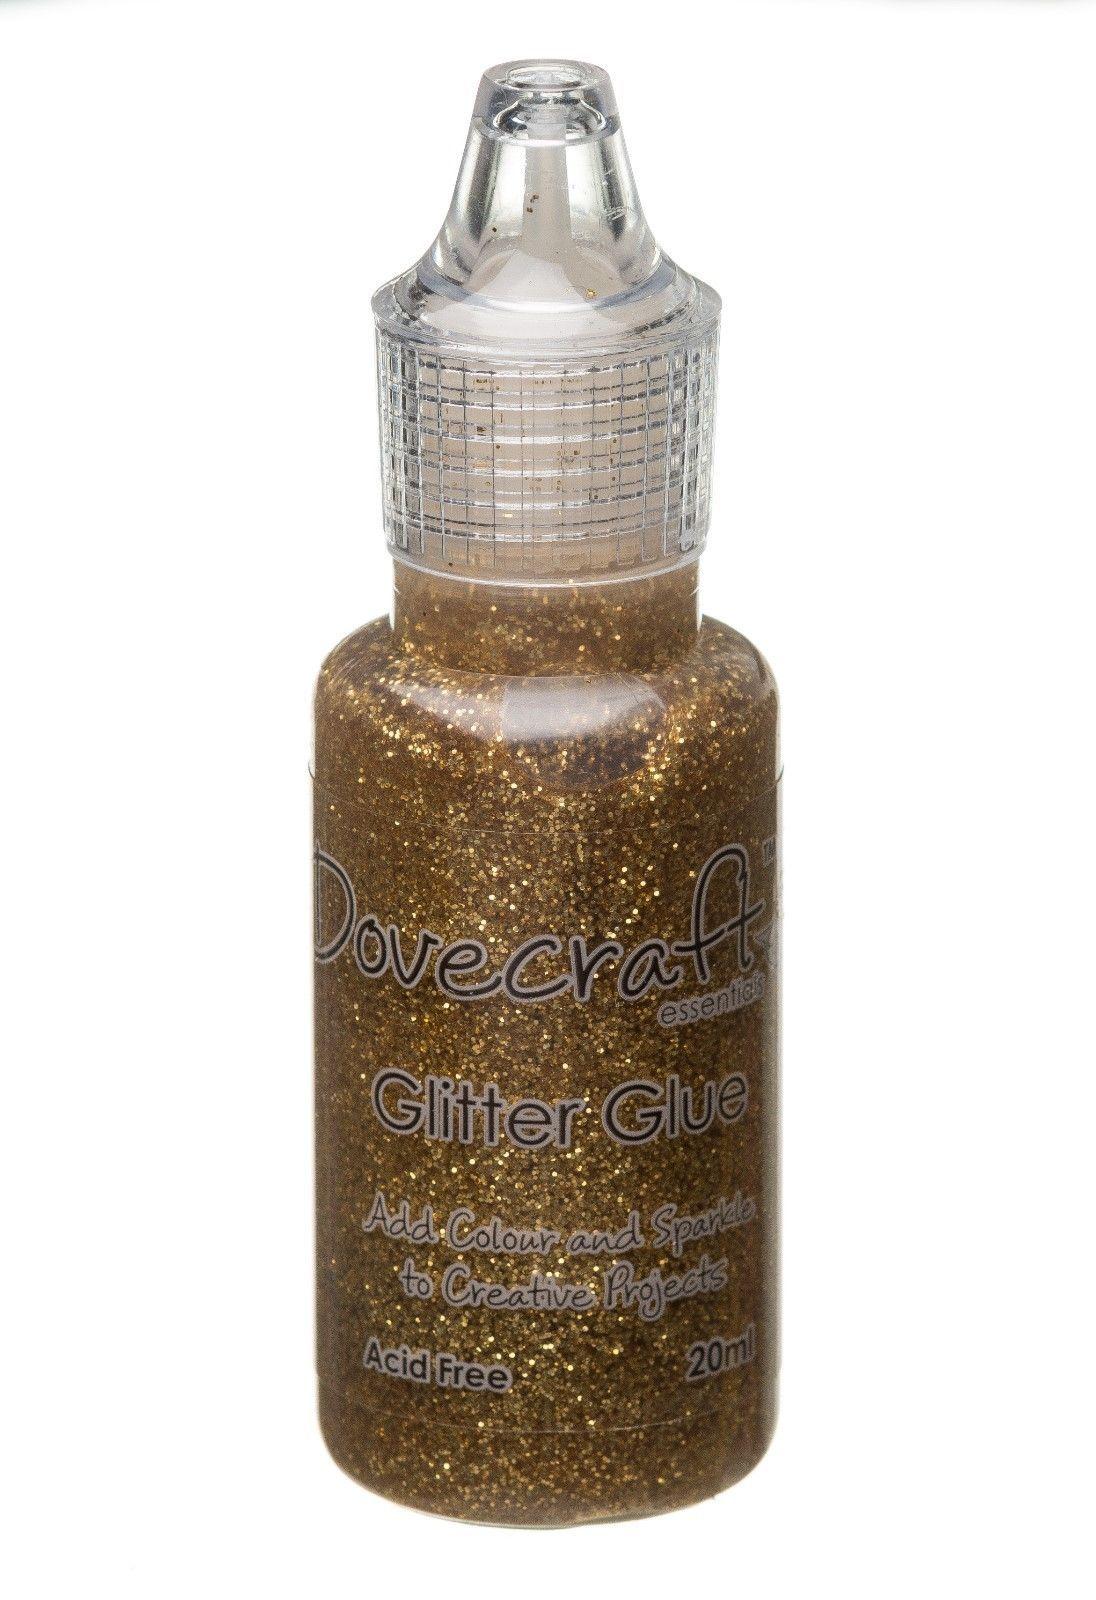 Dovecraft Glitter Glue 20ml - Gold